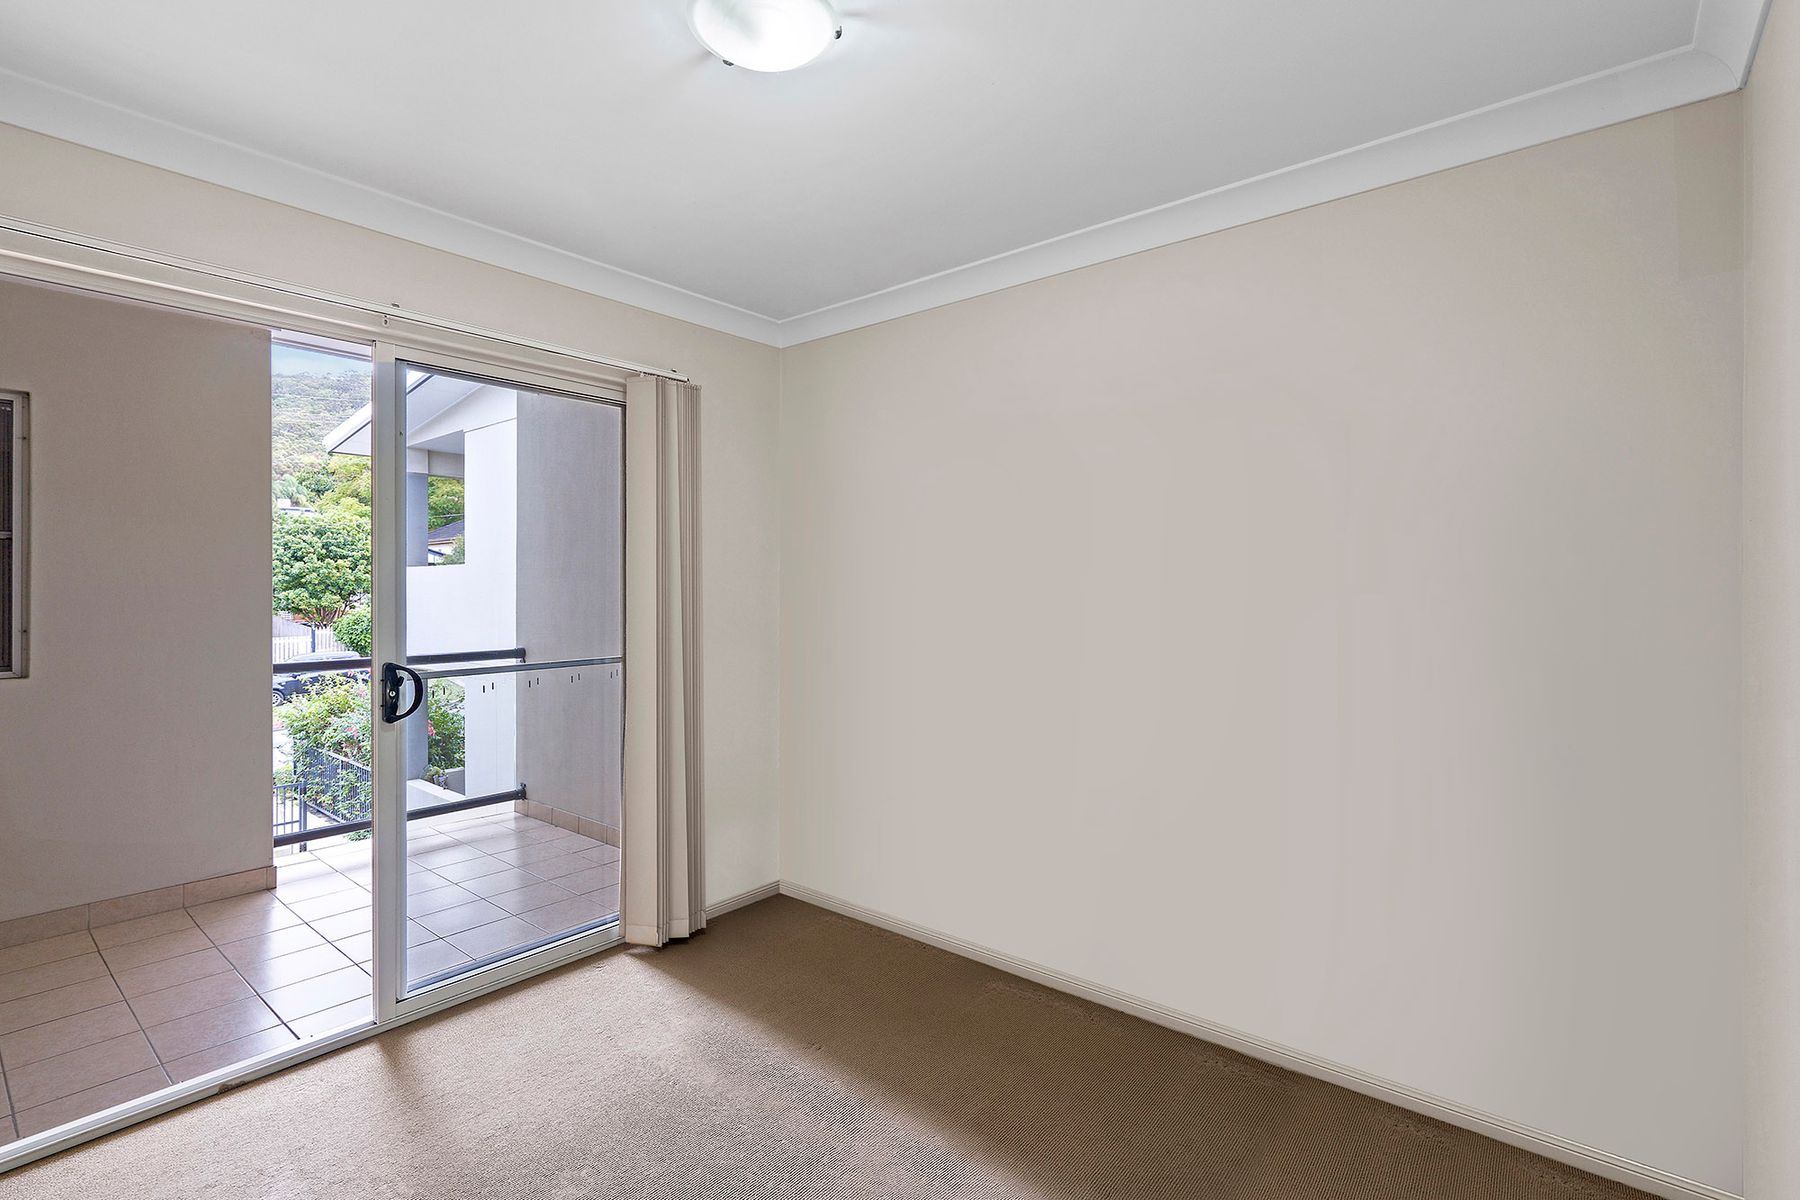 14/84 Tenby Street, Mount Gravatt, QLD 4122